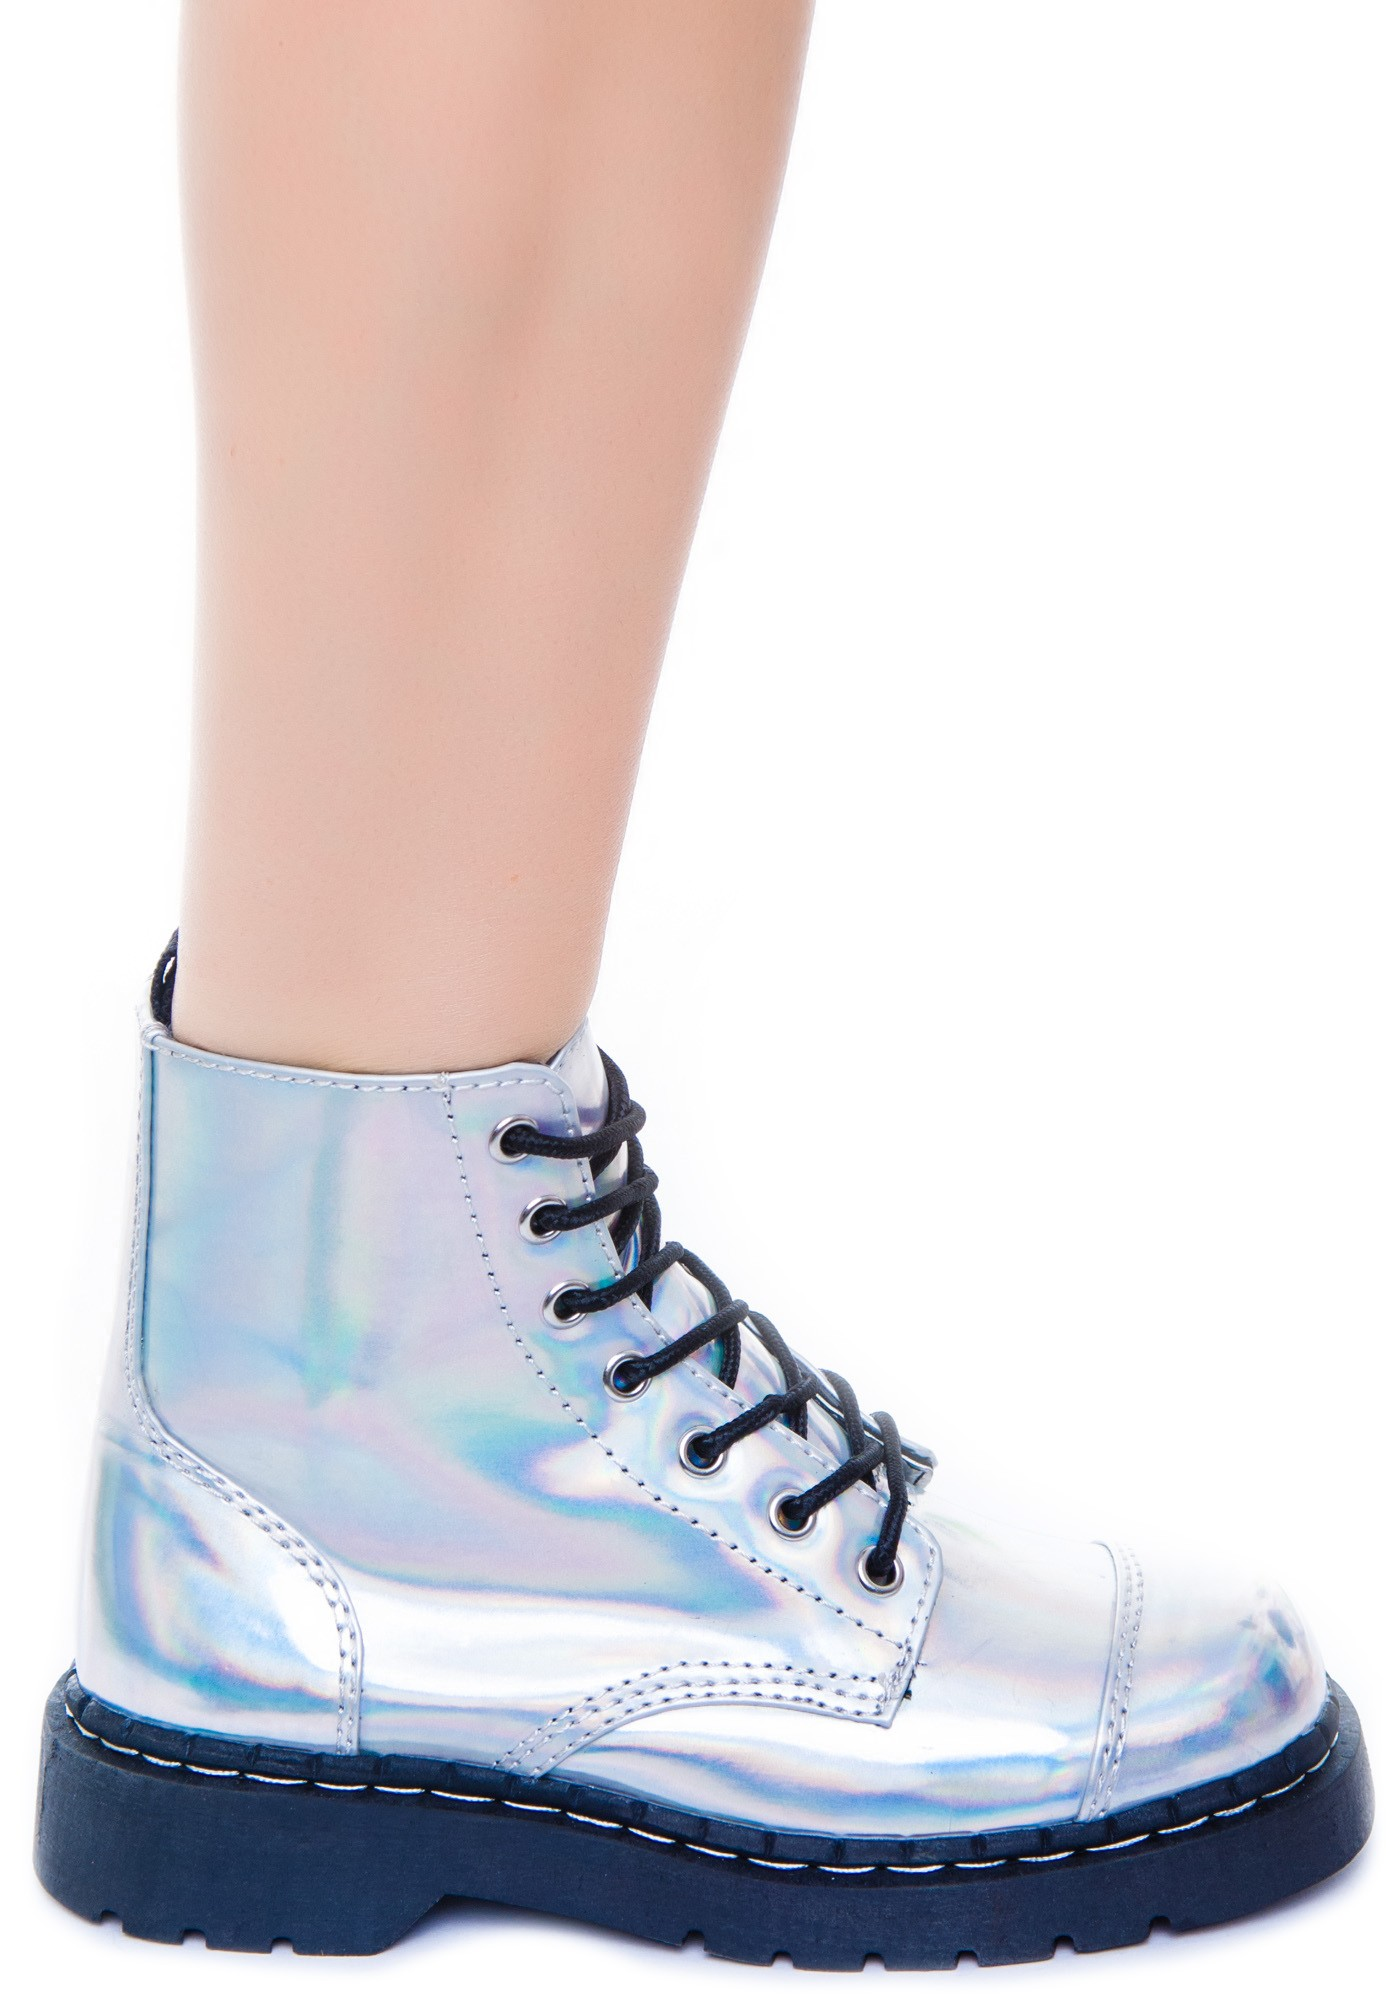 T.u.k. iridescent 7 eye boot